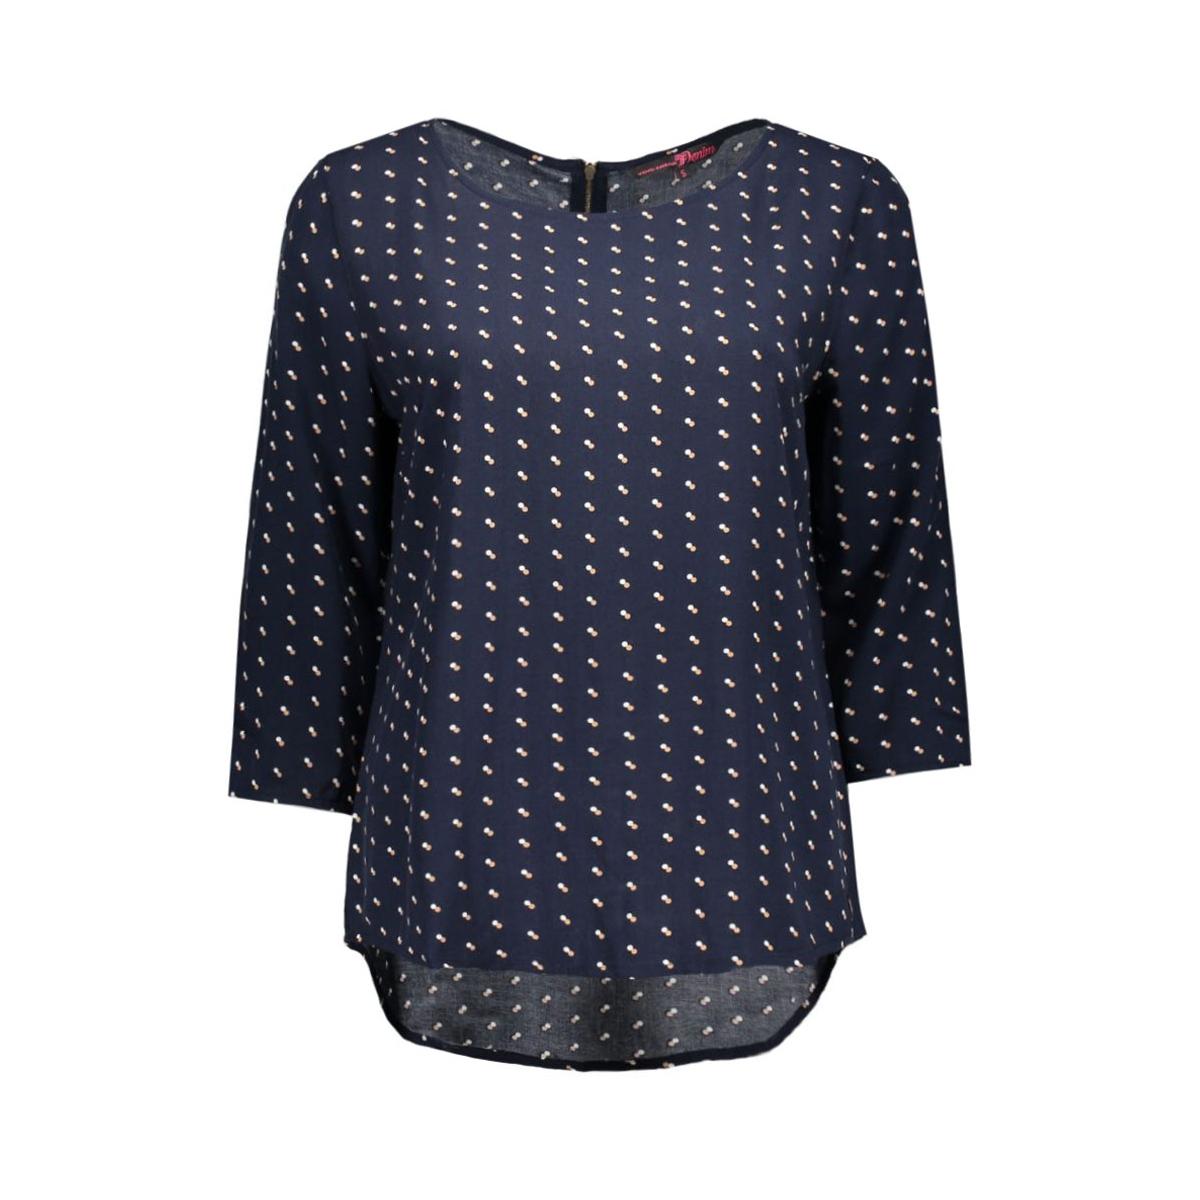 2032352.70.71 tom tailor t-shirt 6901